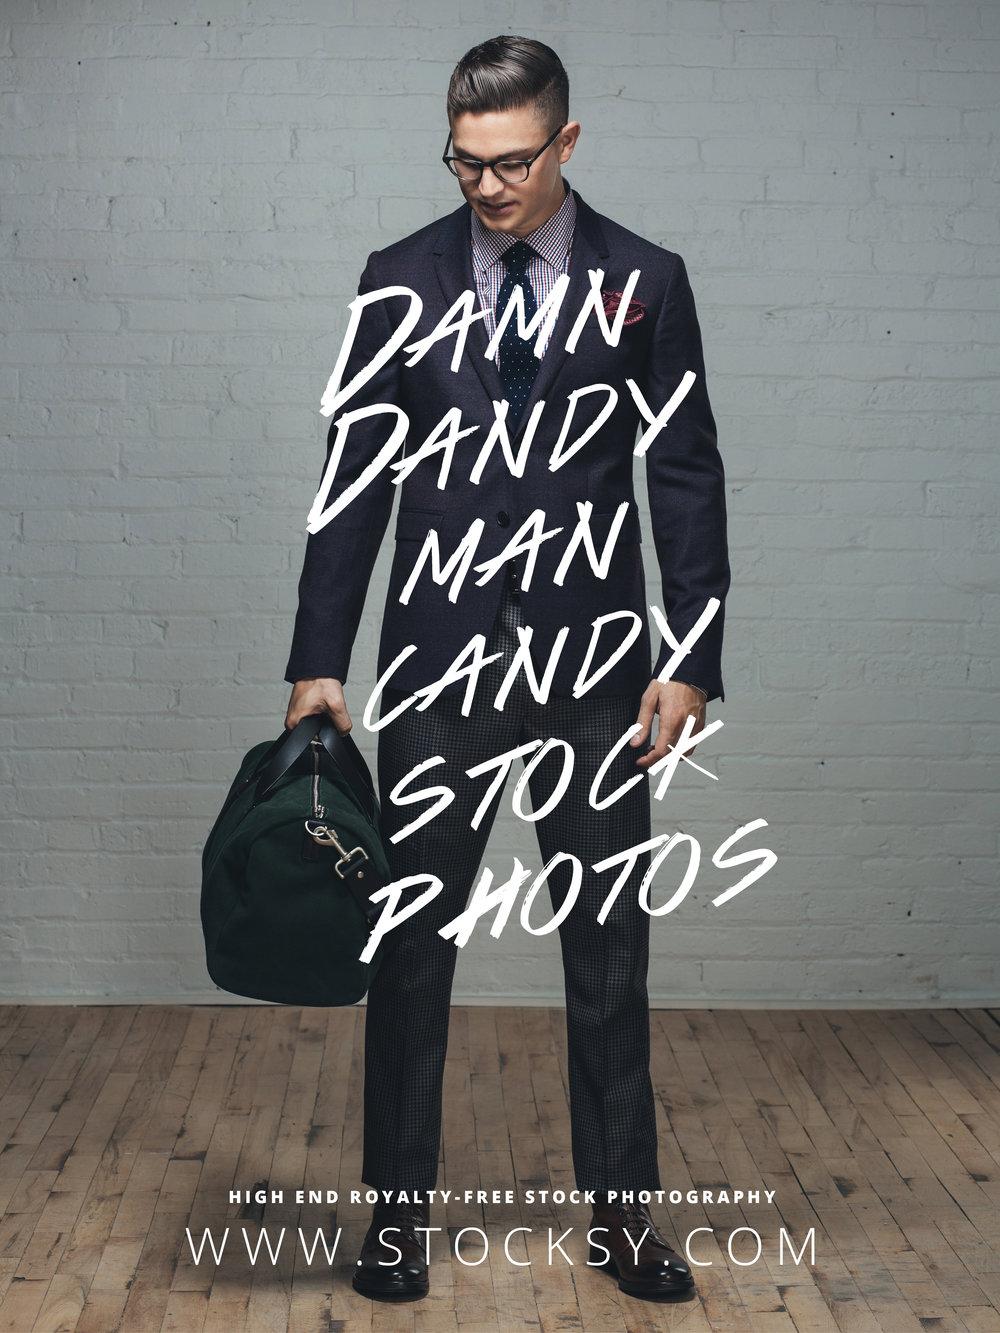 Stocksy_PRINT_Mandy314IPAD.jpg